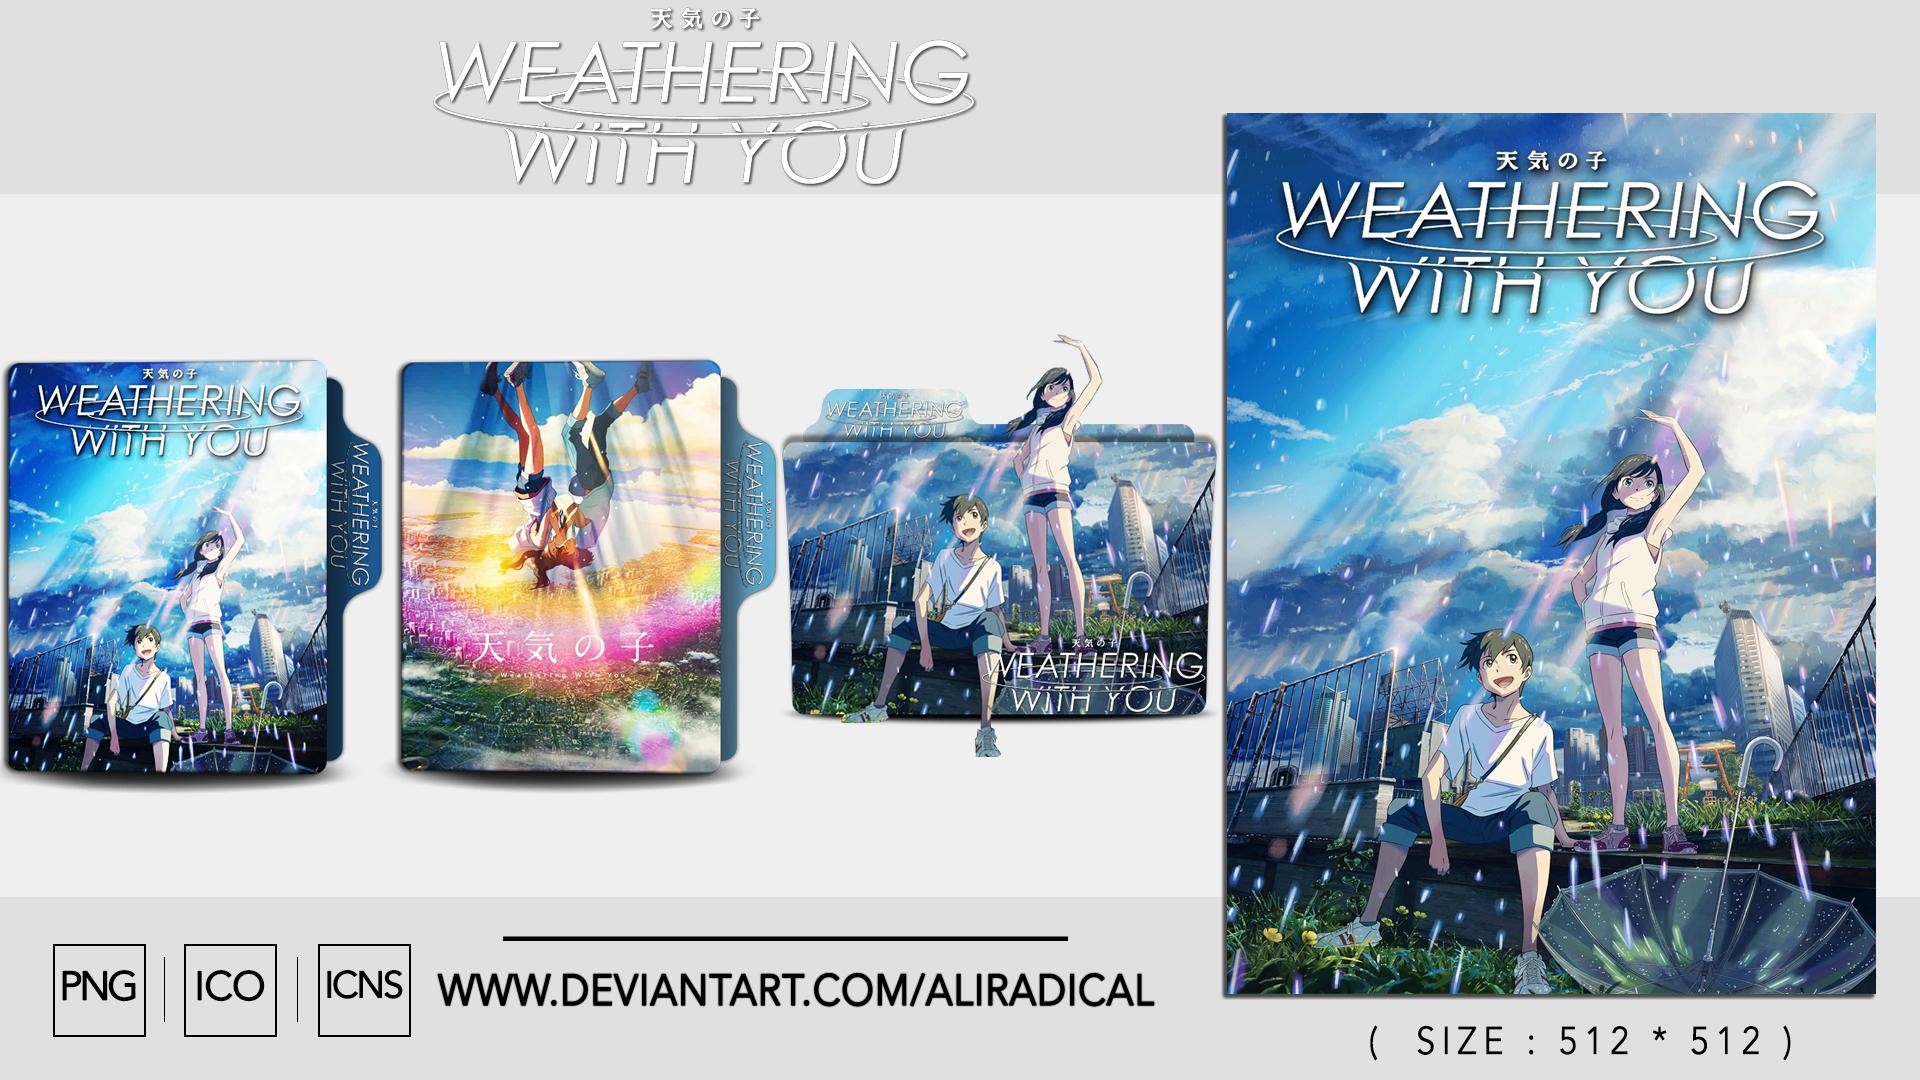 Weathering With You 2019 Folder Icon By Aliradical On Deviantart